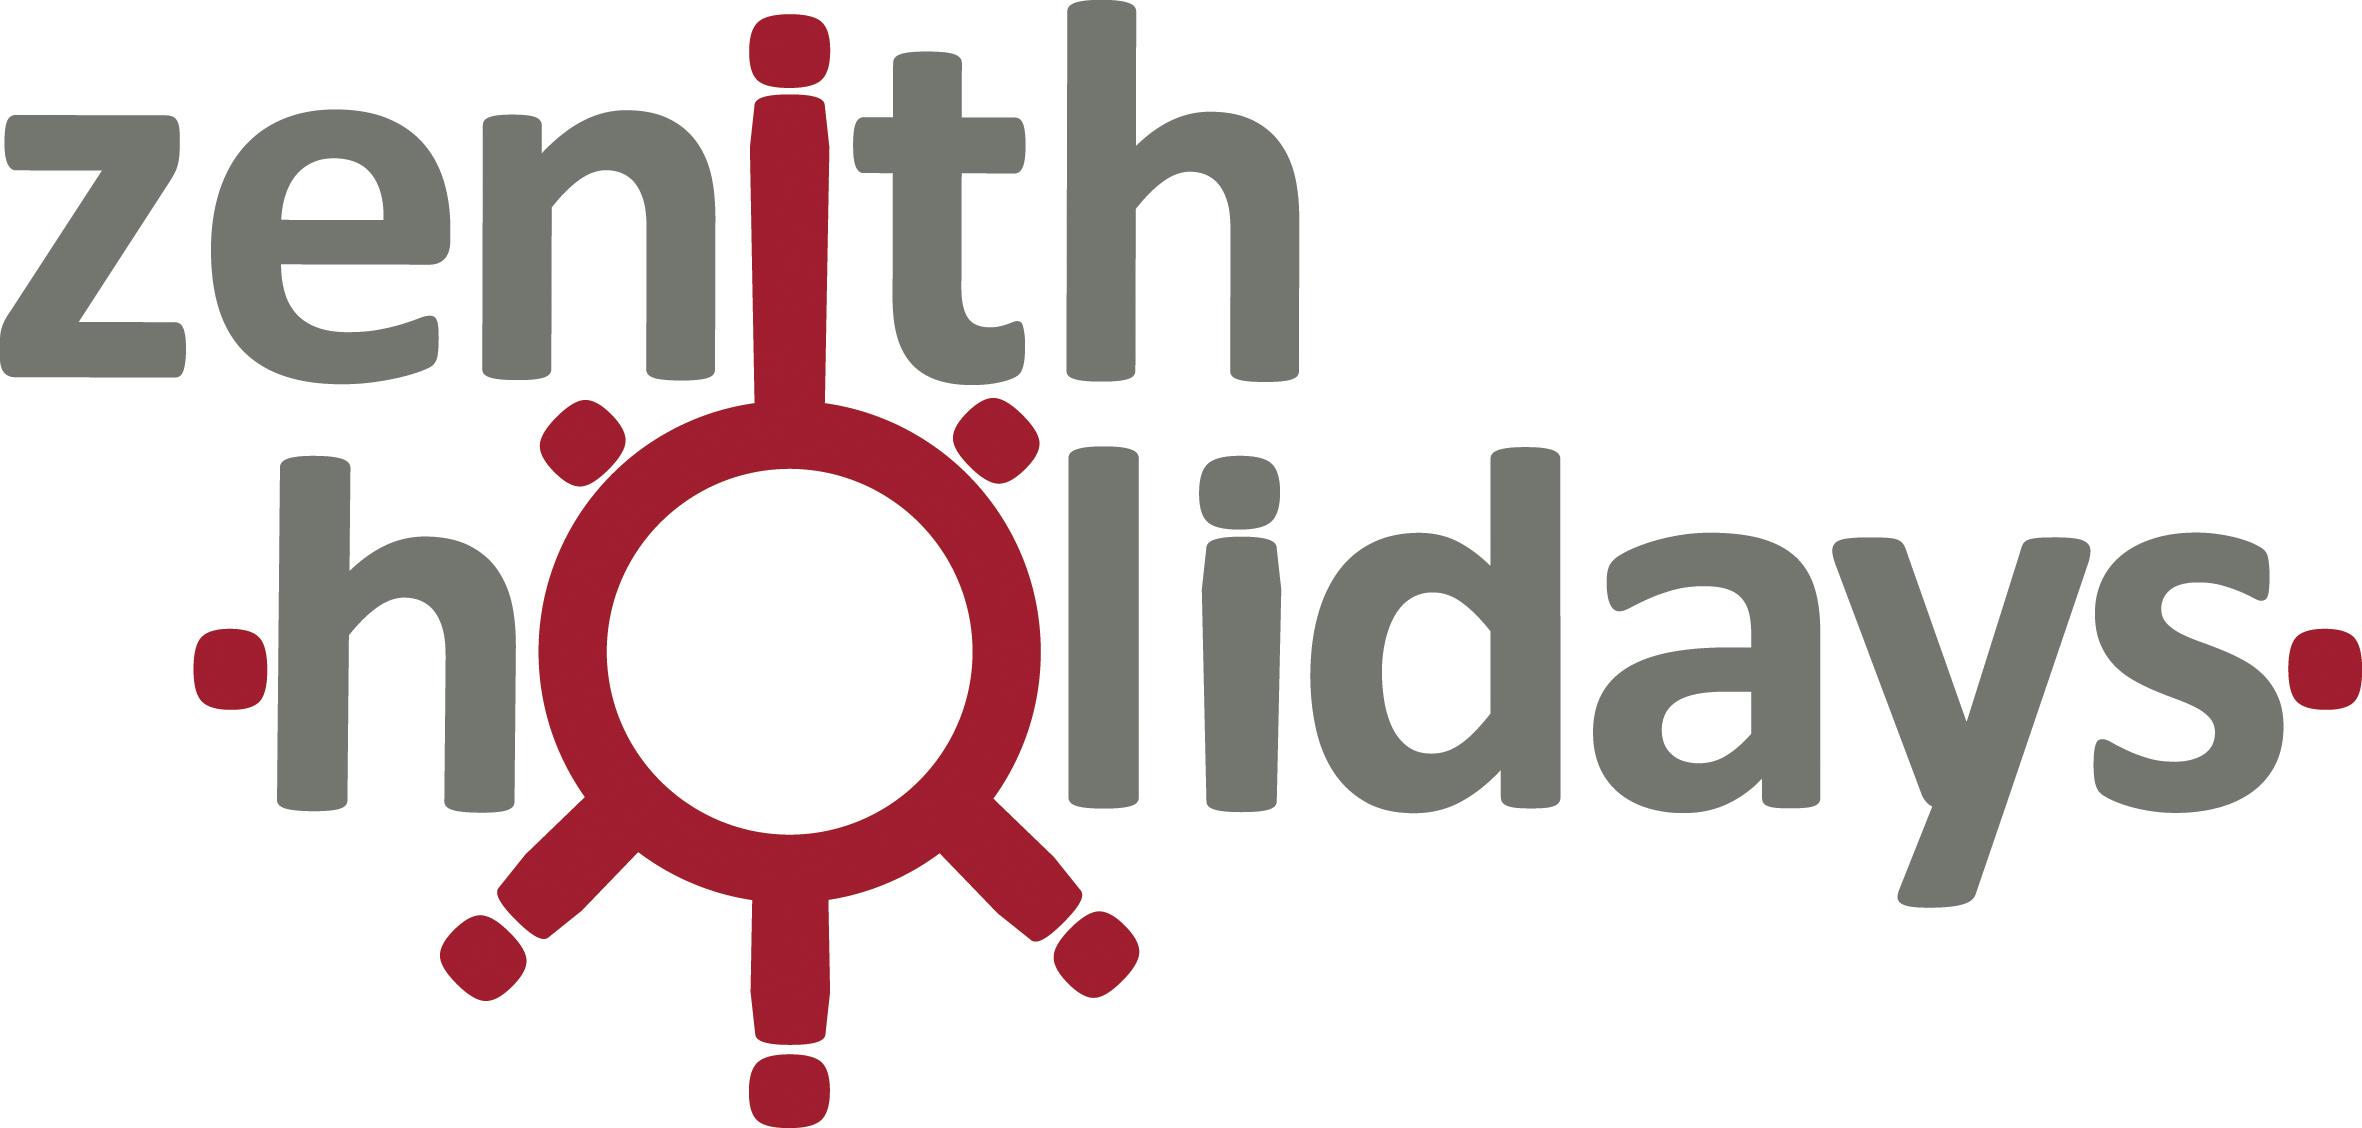 Zenith Holidays.jpg